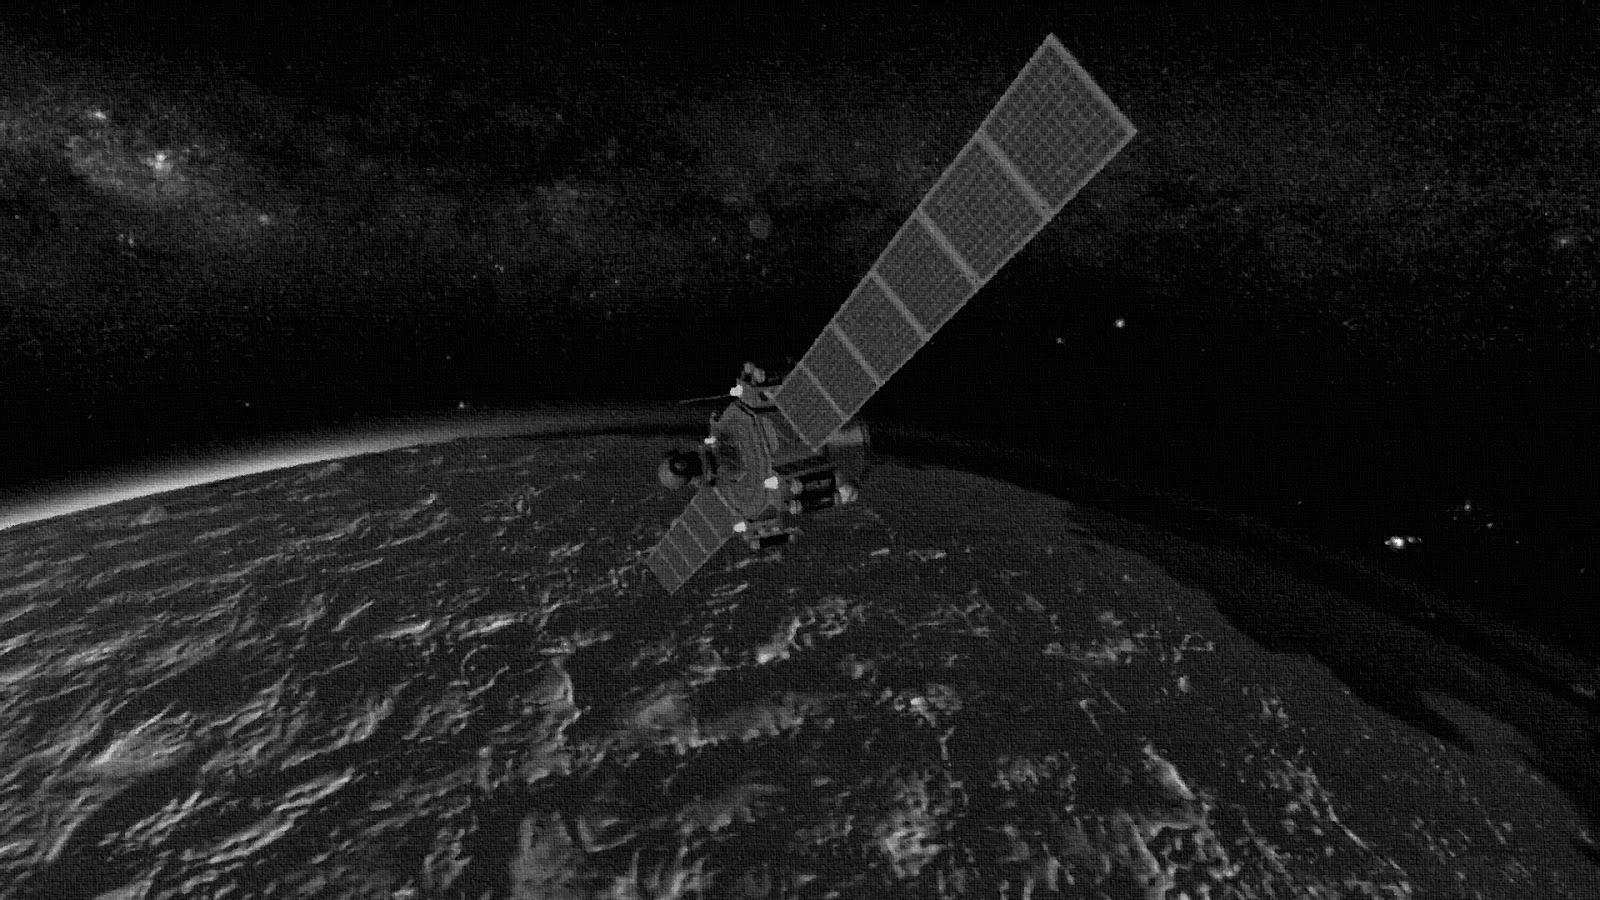 Kerbal Space Program Mission Reports Ksp The Kerbal